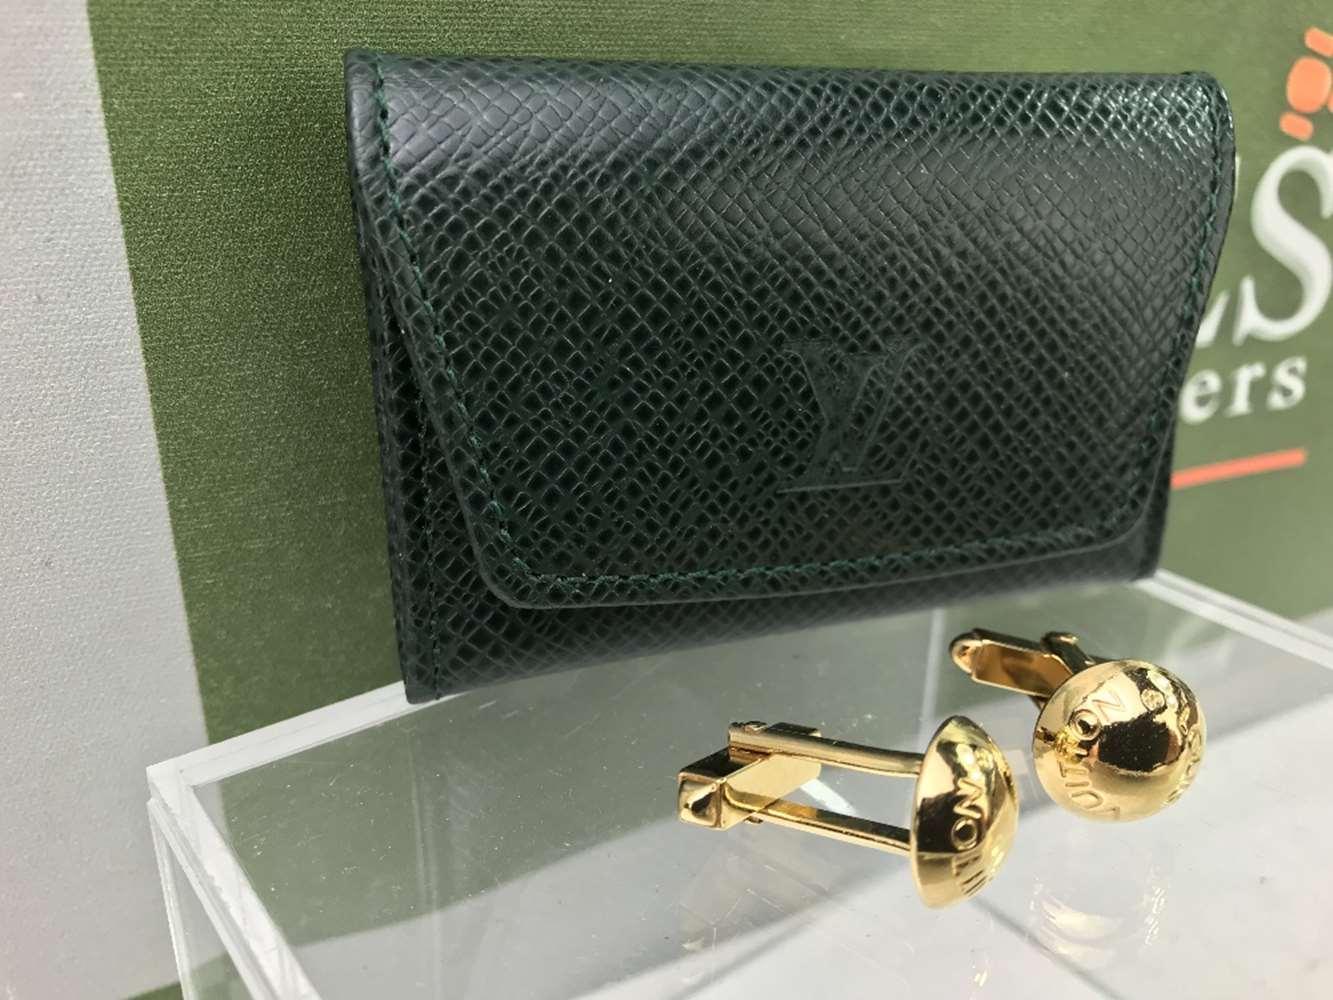 Lot 10 - Louis Vuitton Gold Plated Cufflinks In Original Case